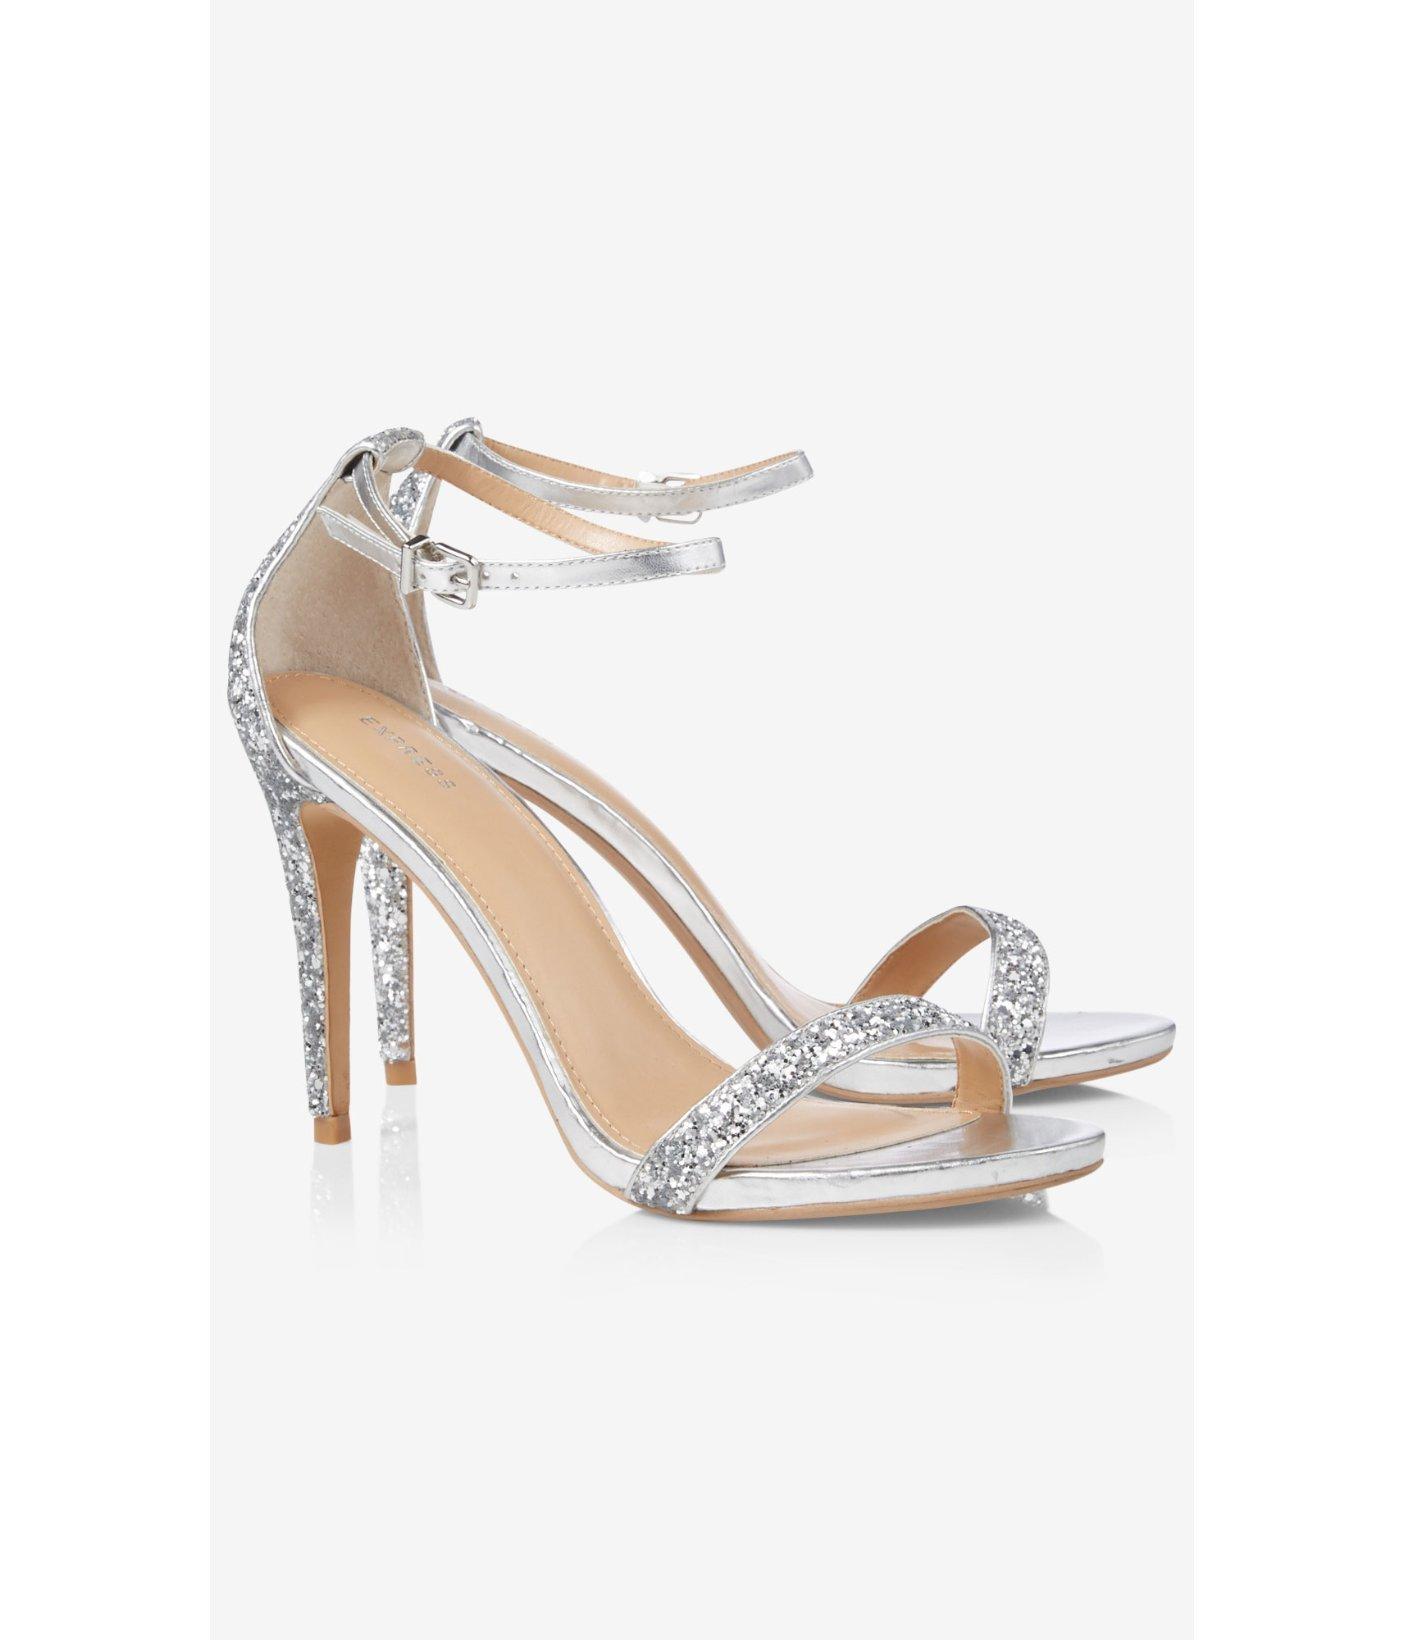 4c7c4368407 Lyst - Express Silver Glitter Sleek Heeled Sandal in Metallic